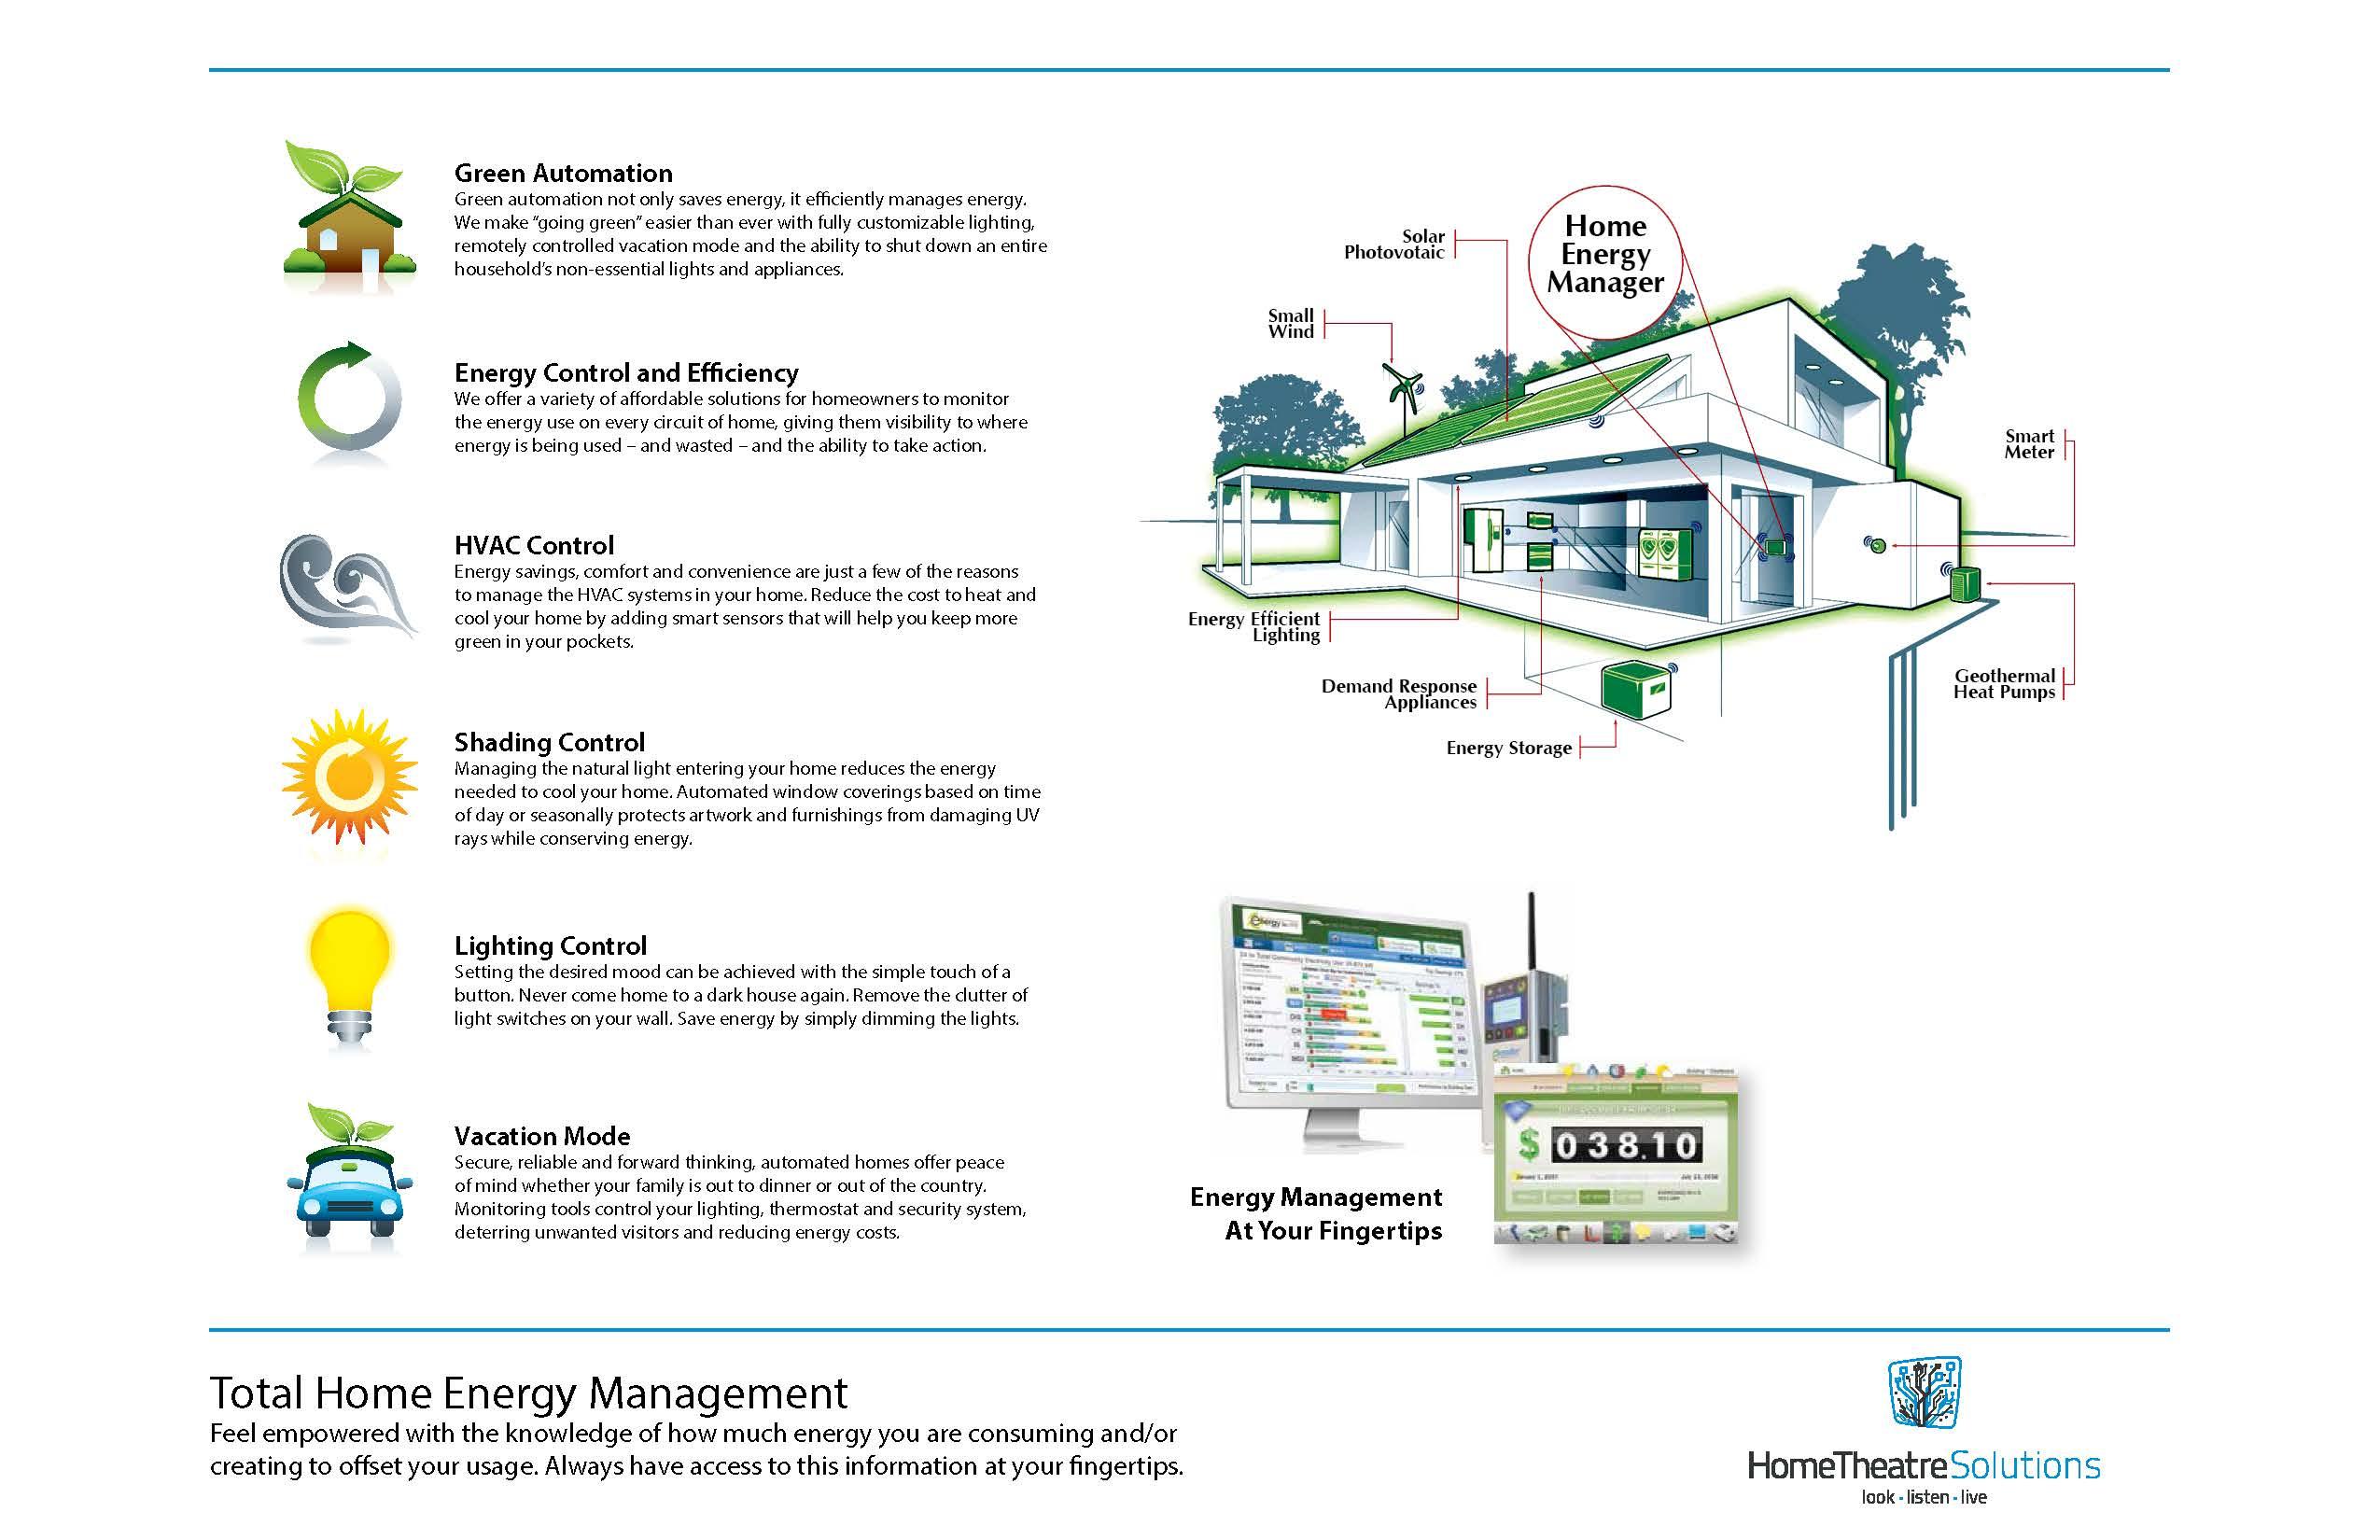 Portfolio Wiring Diagram For Energy Management Hothso Salesportfolio V1 Page 08 09 10 11